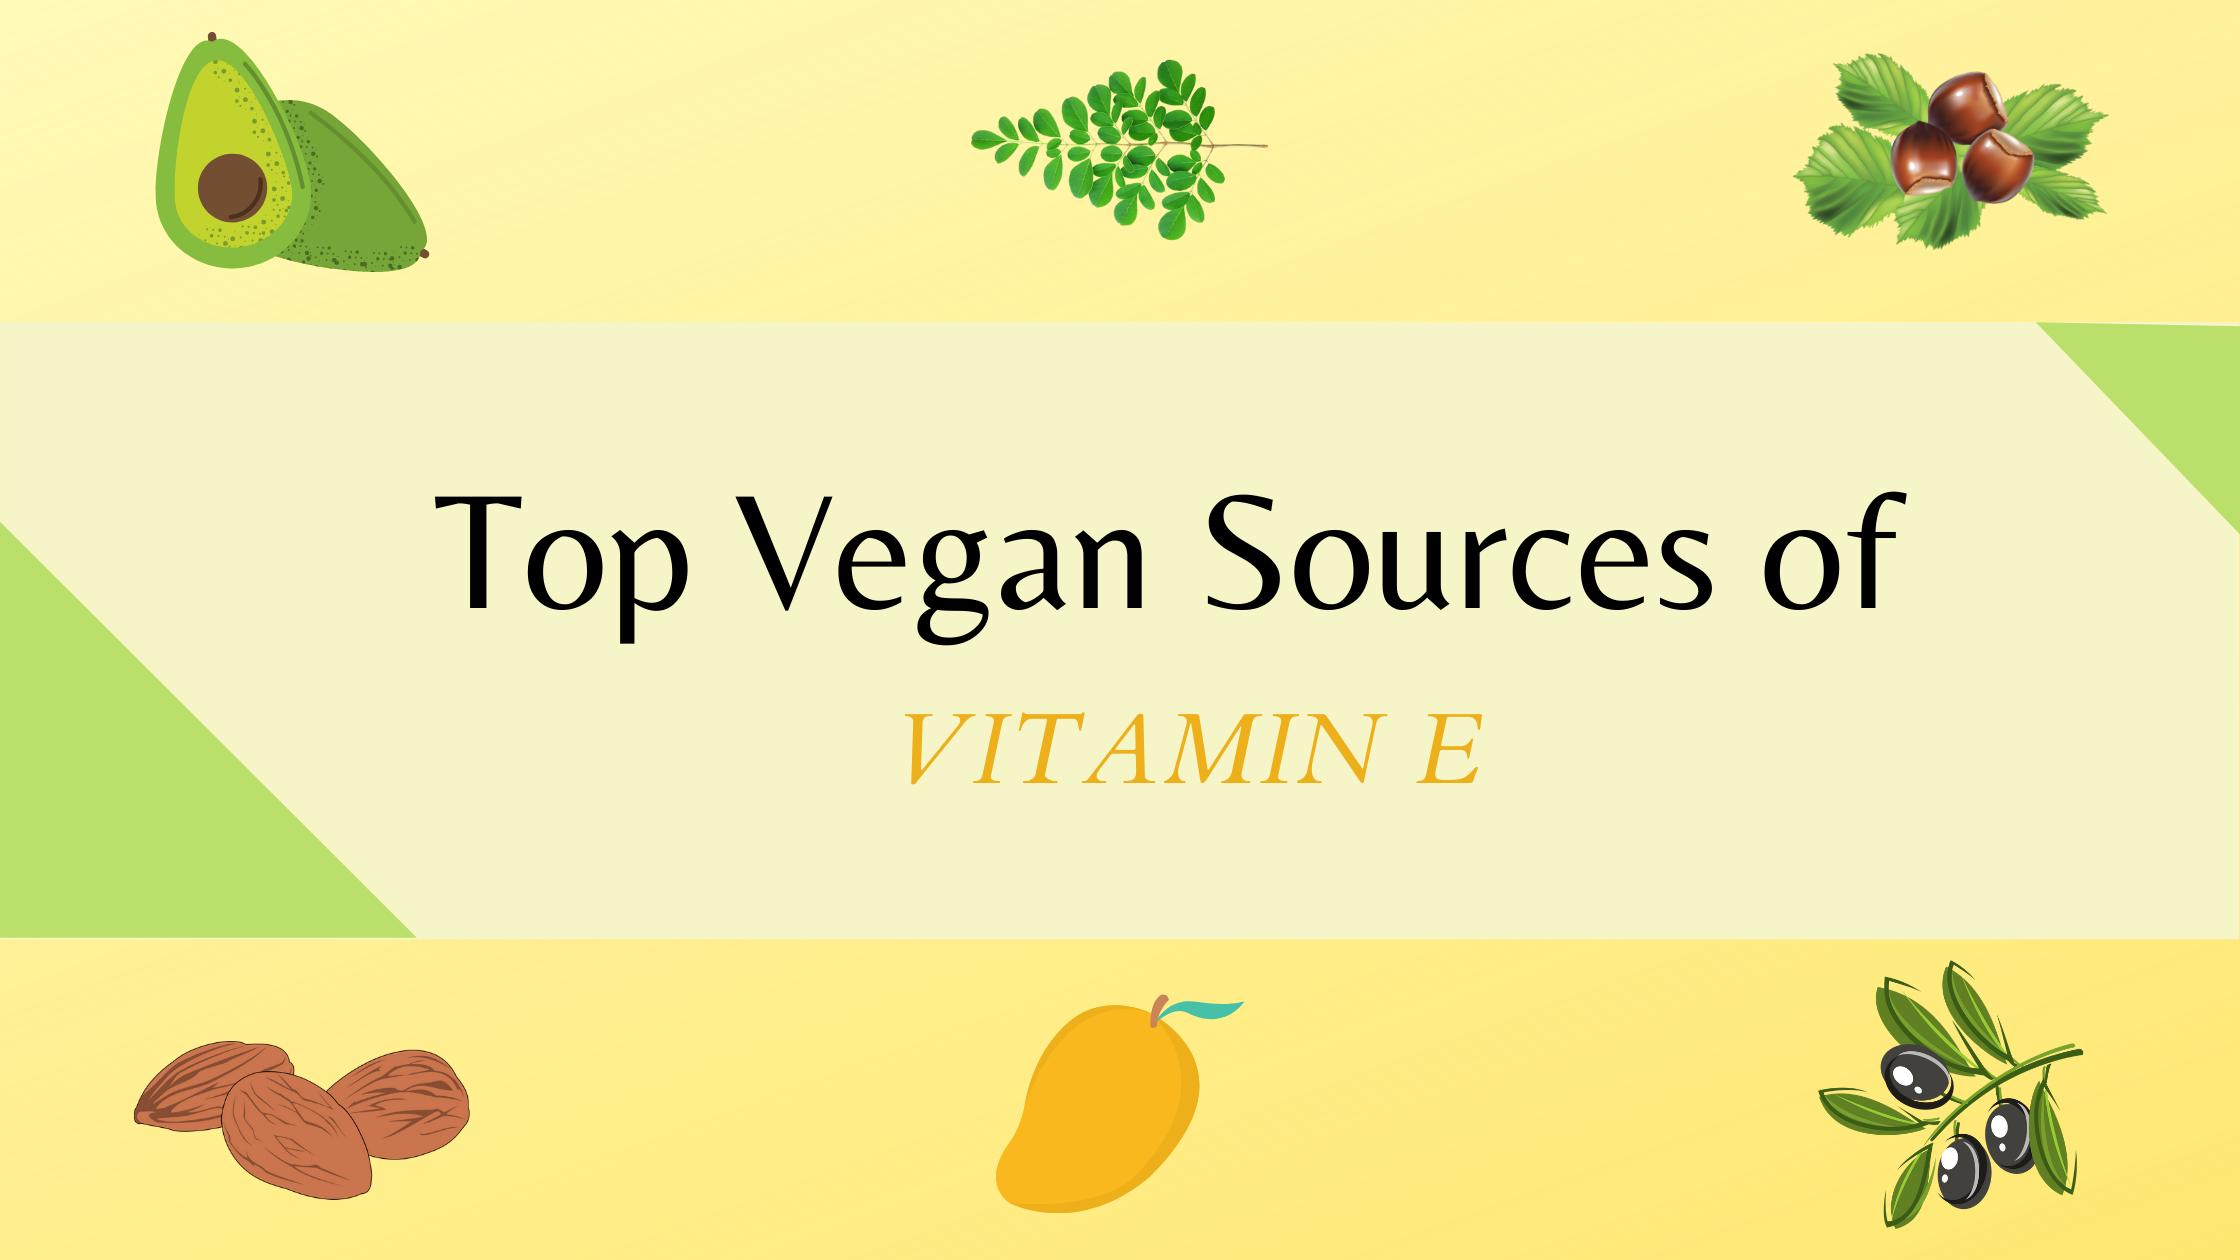 vitamin e rich vegan food sources